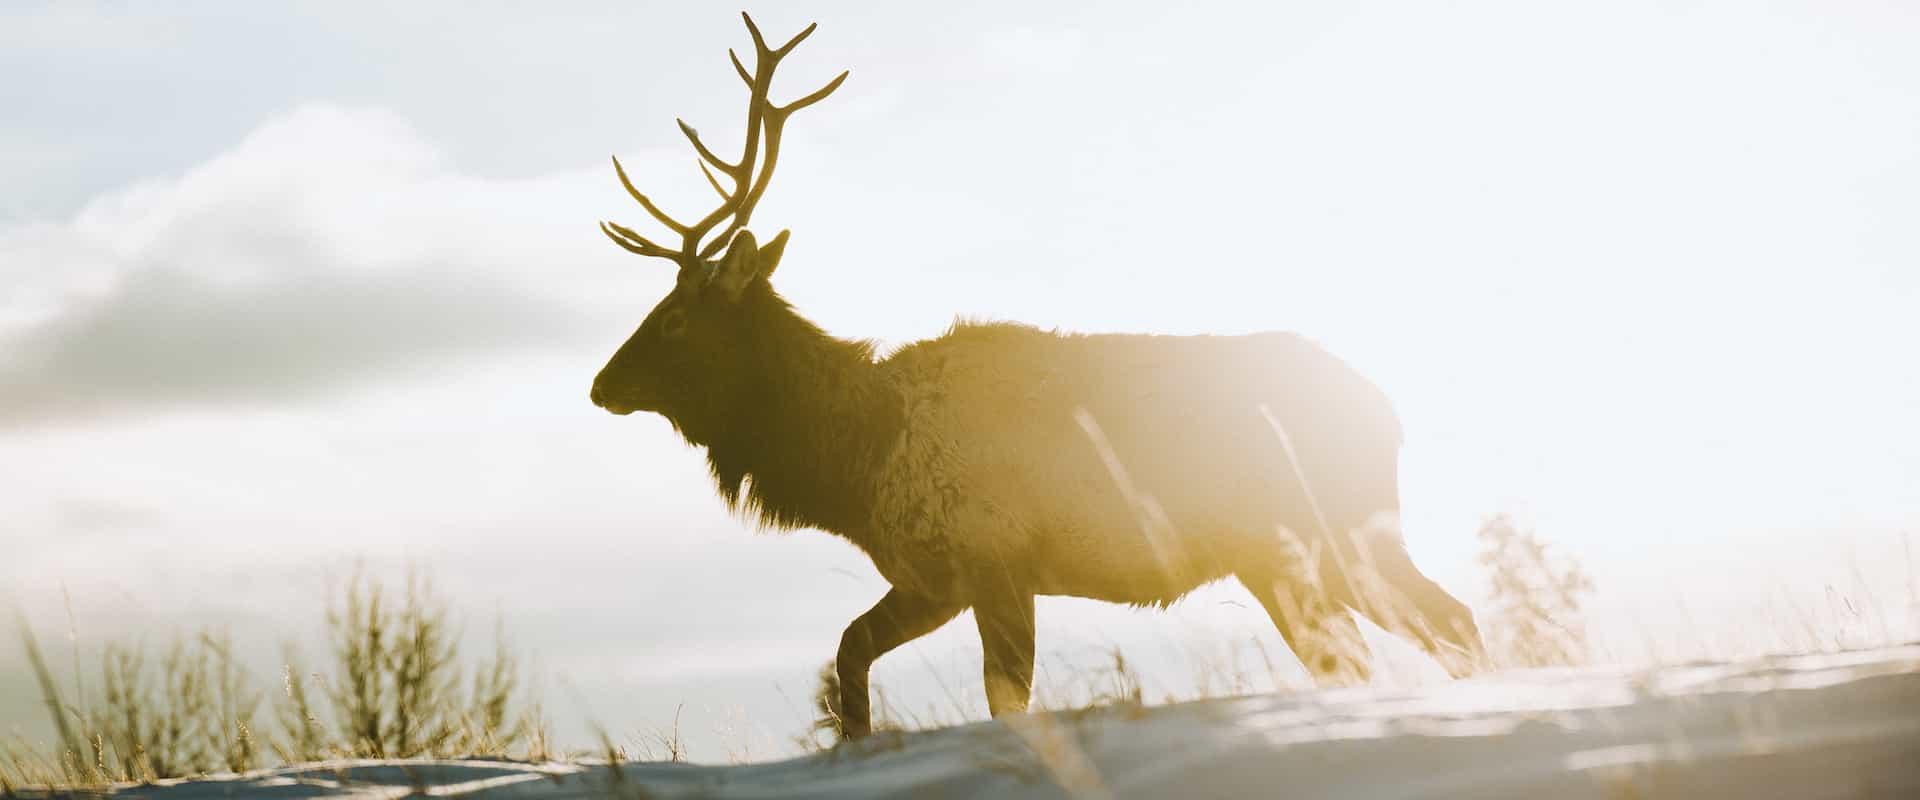 See wildlife such as elk in Banff National Park